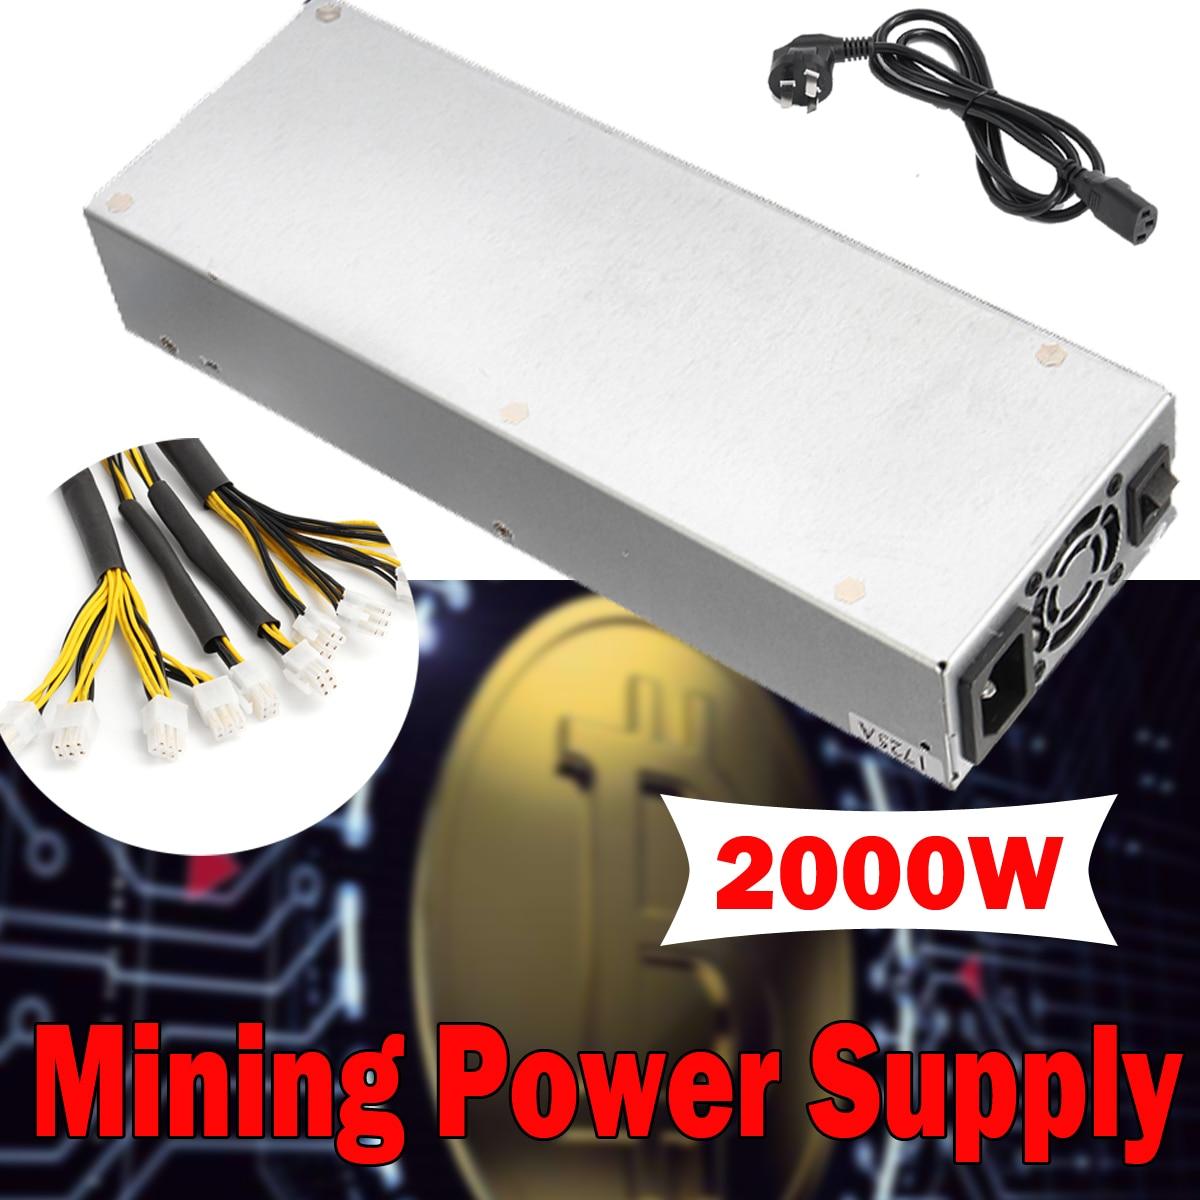 цена на 92.5% Efficiency 2000W Mining Power Supply For Eth Rig Ethereum Bitcoin Miner Mining Machine S7 S9 200-240V 90